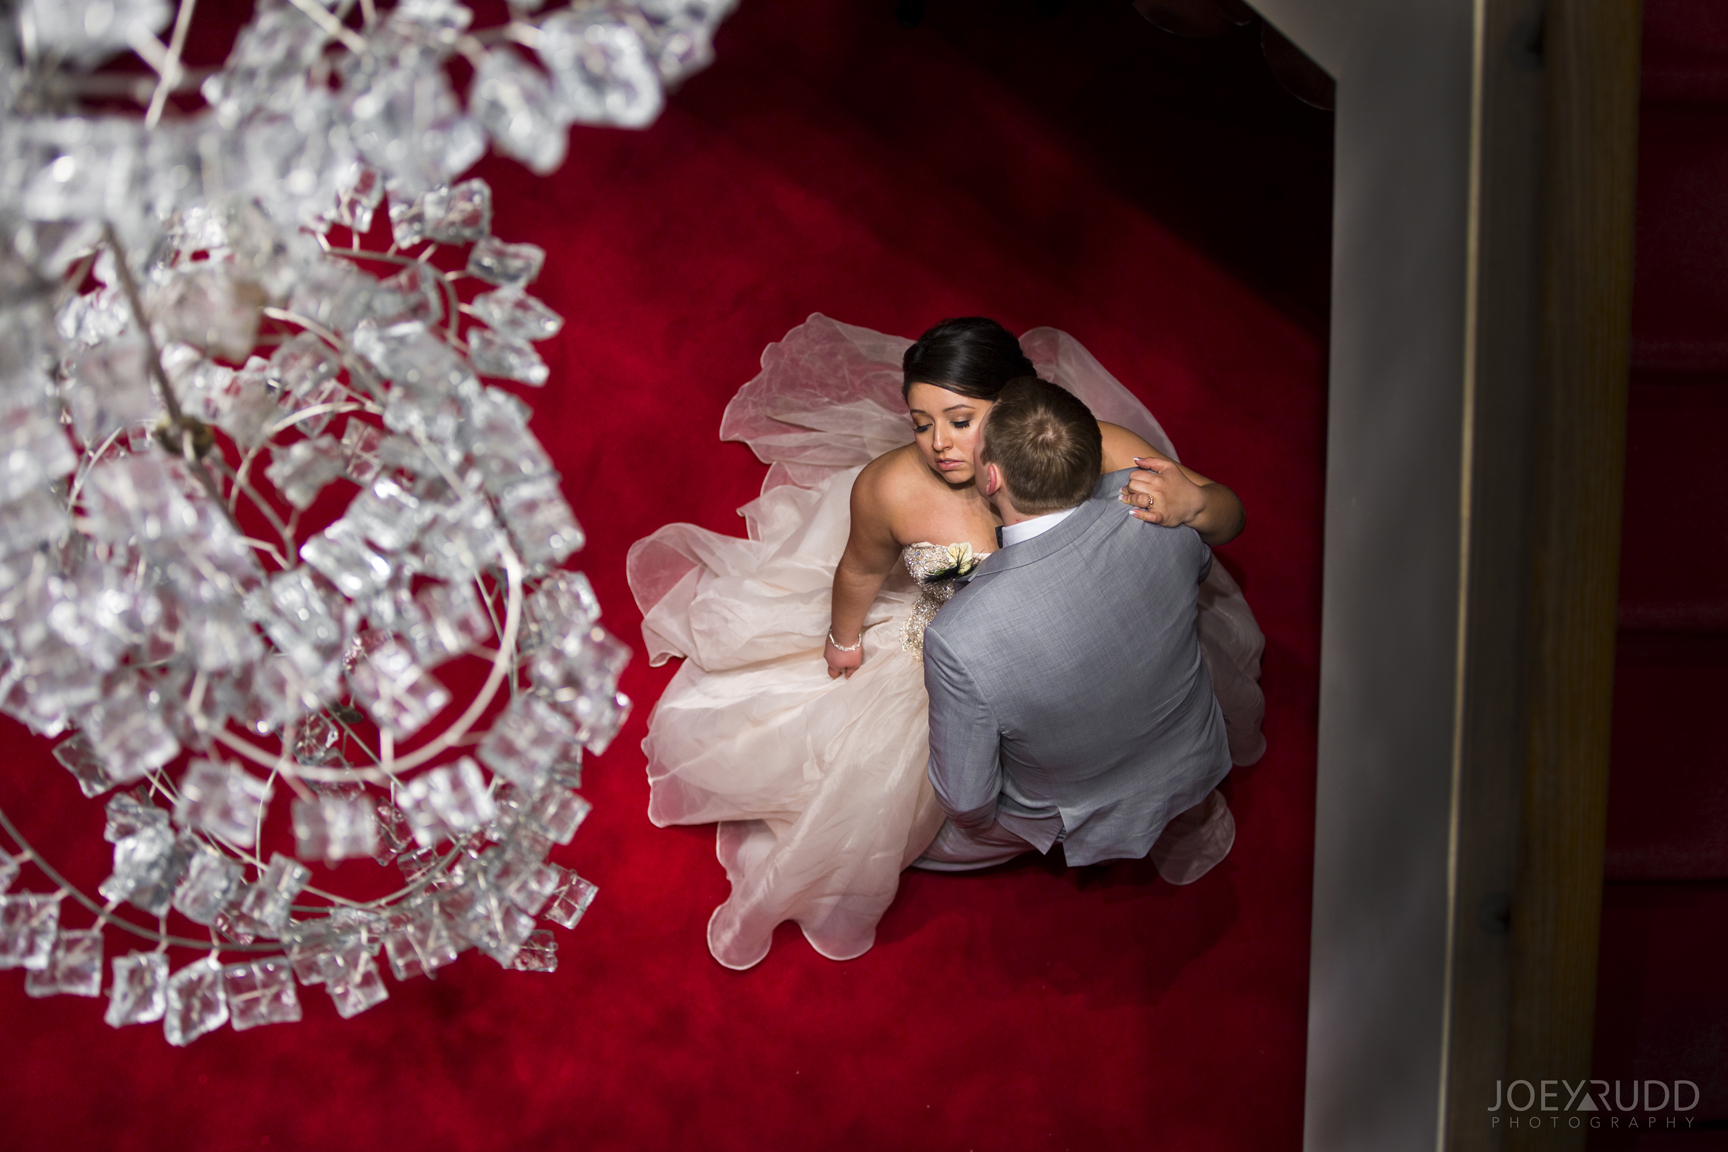 Ottawa Winter Wedding at the NAC by Joey Rudd Photography 2